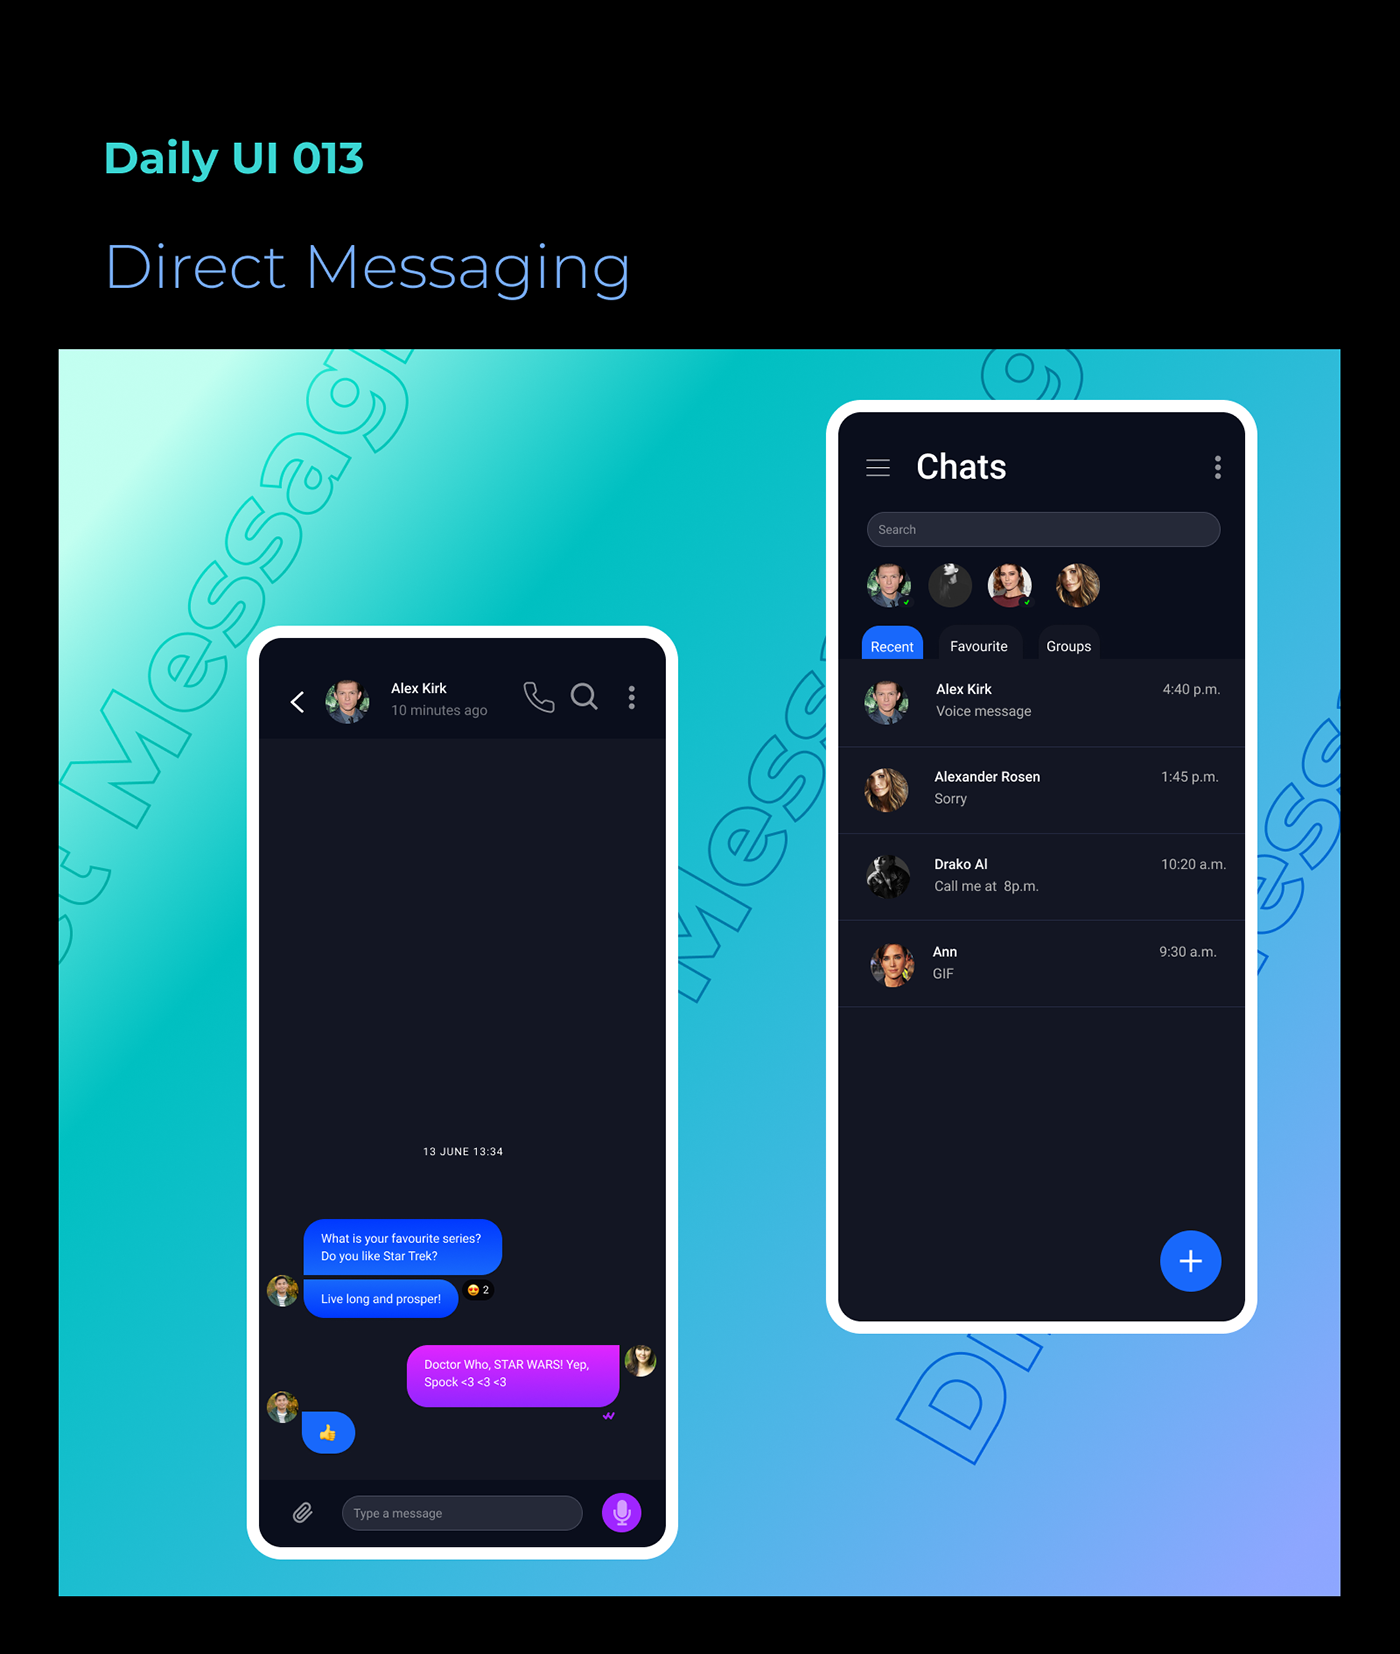 Direct Messaging dailyUI 013